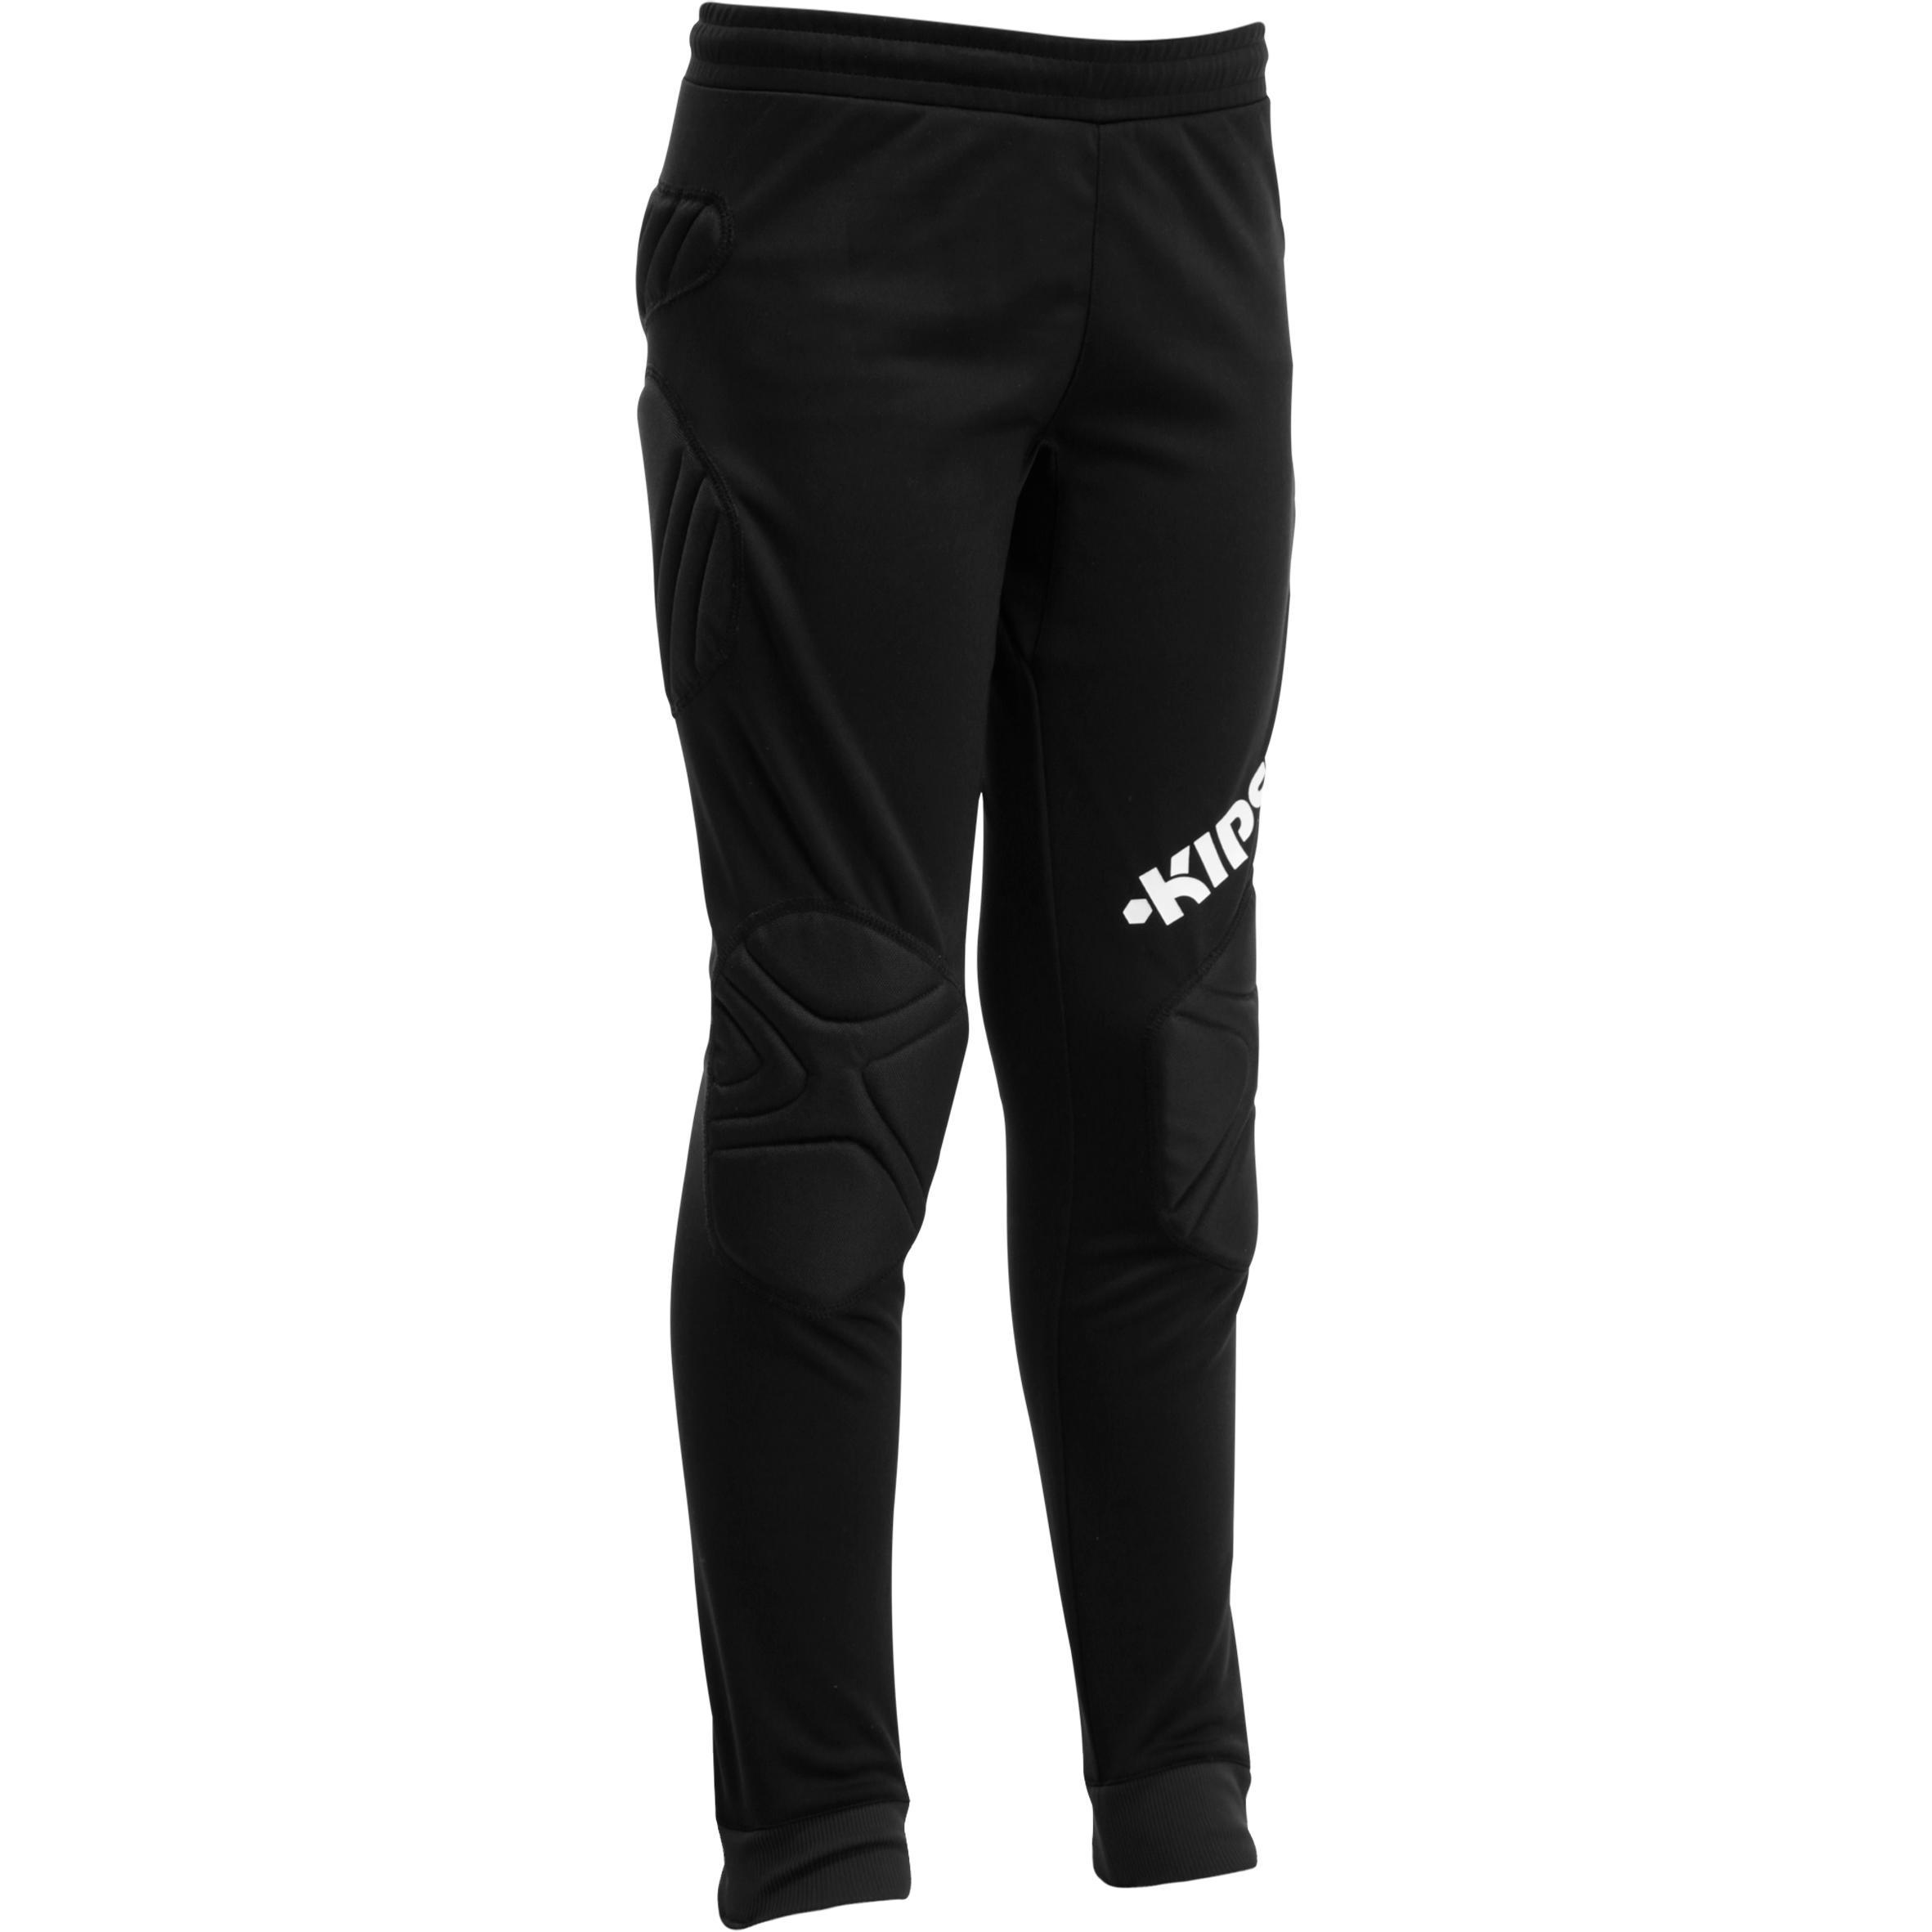 Pantalon de gardien de soccer adulte F300 noir